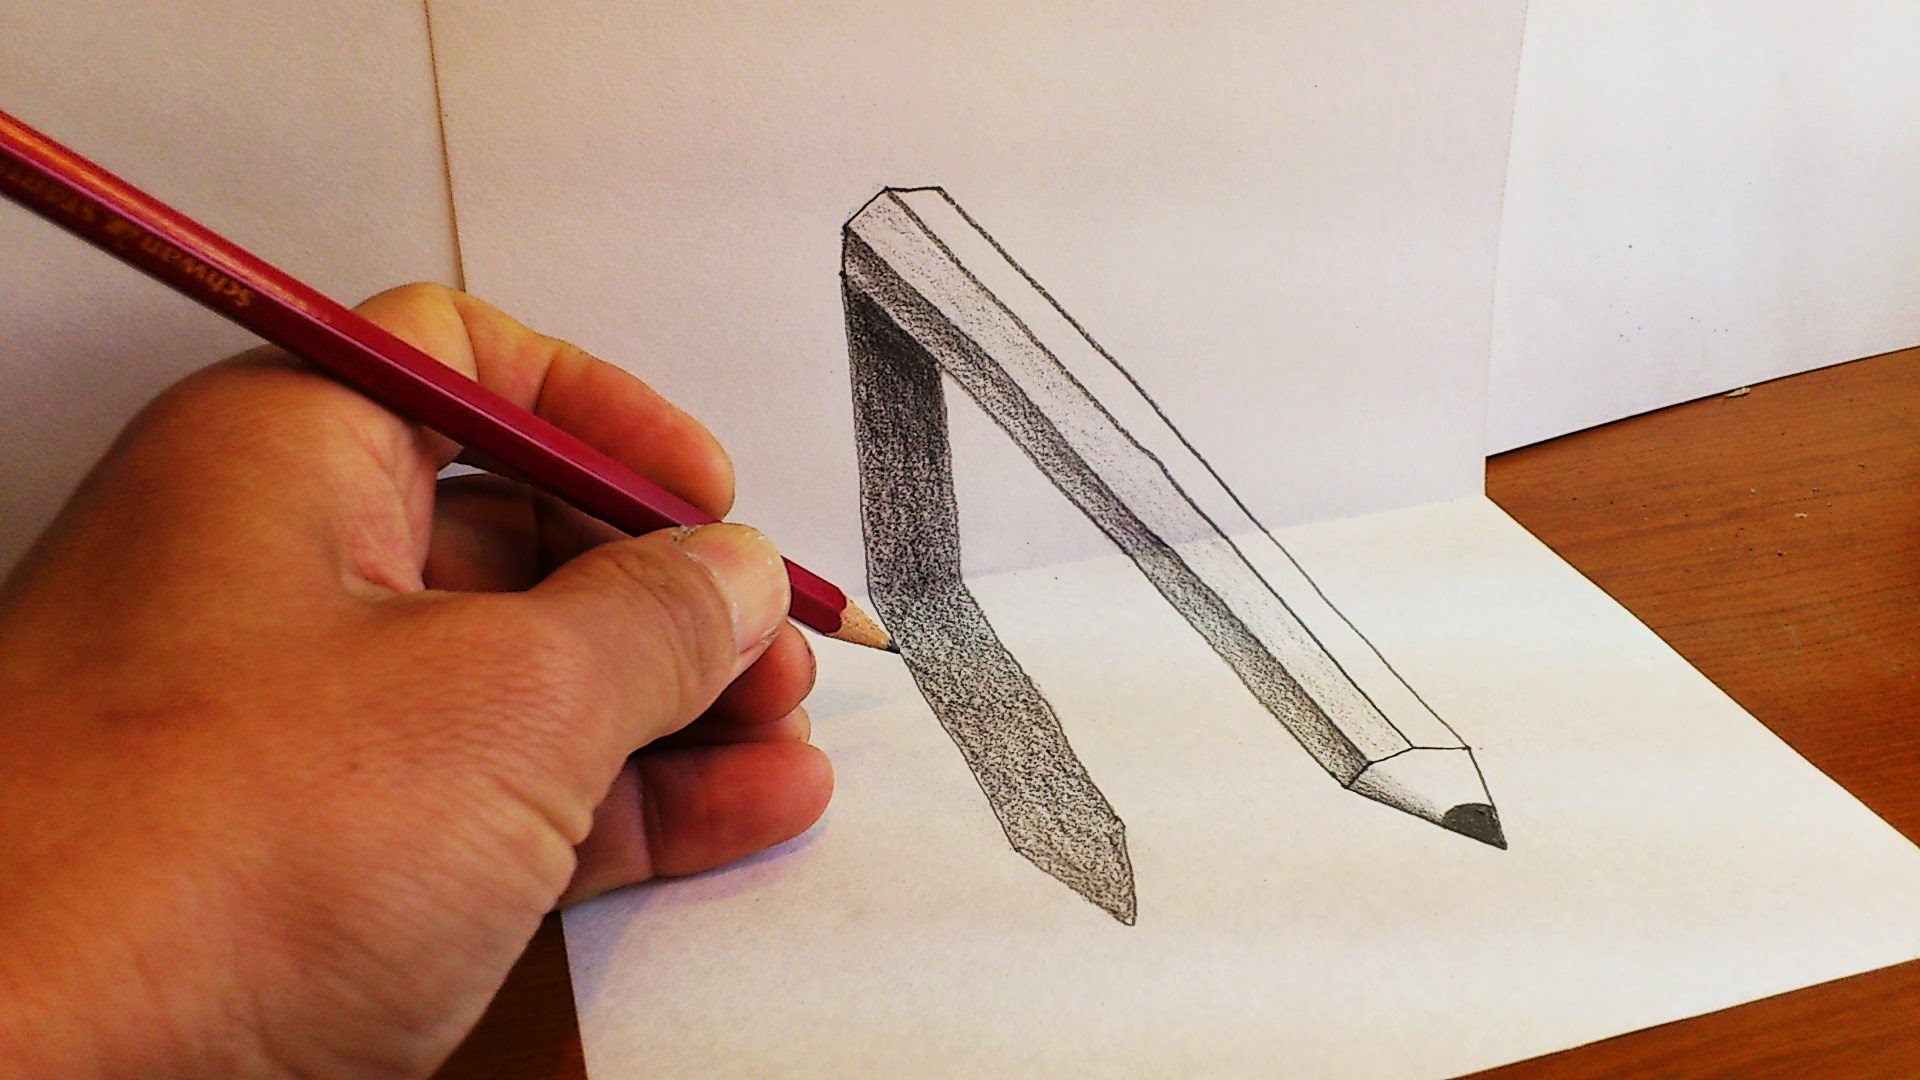 Drawn 3d art paper Art pencil 3D Unsubscribe YouTube